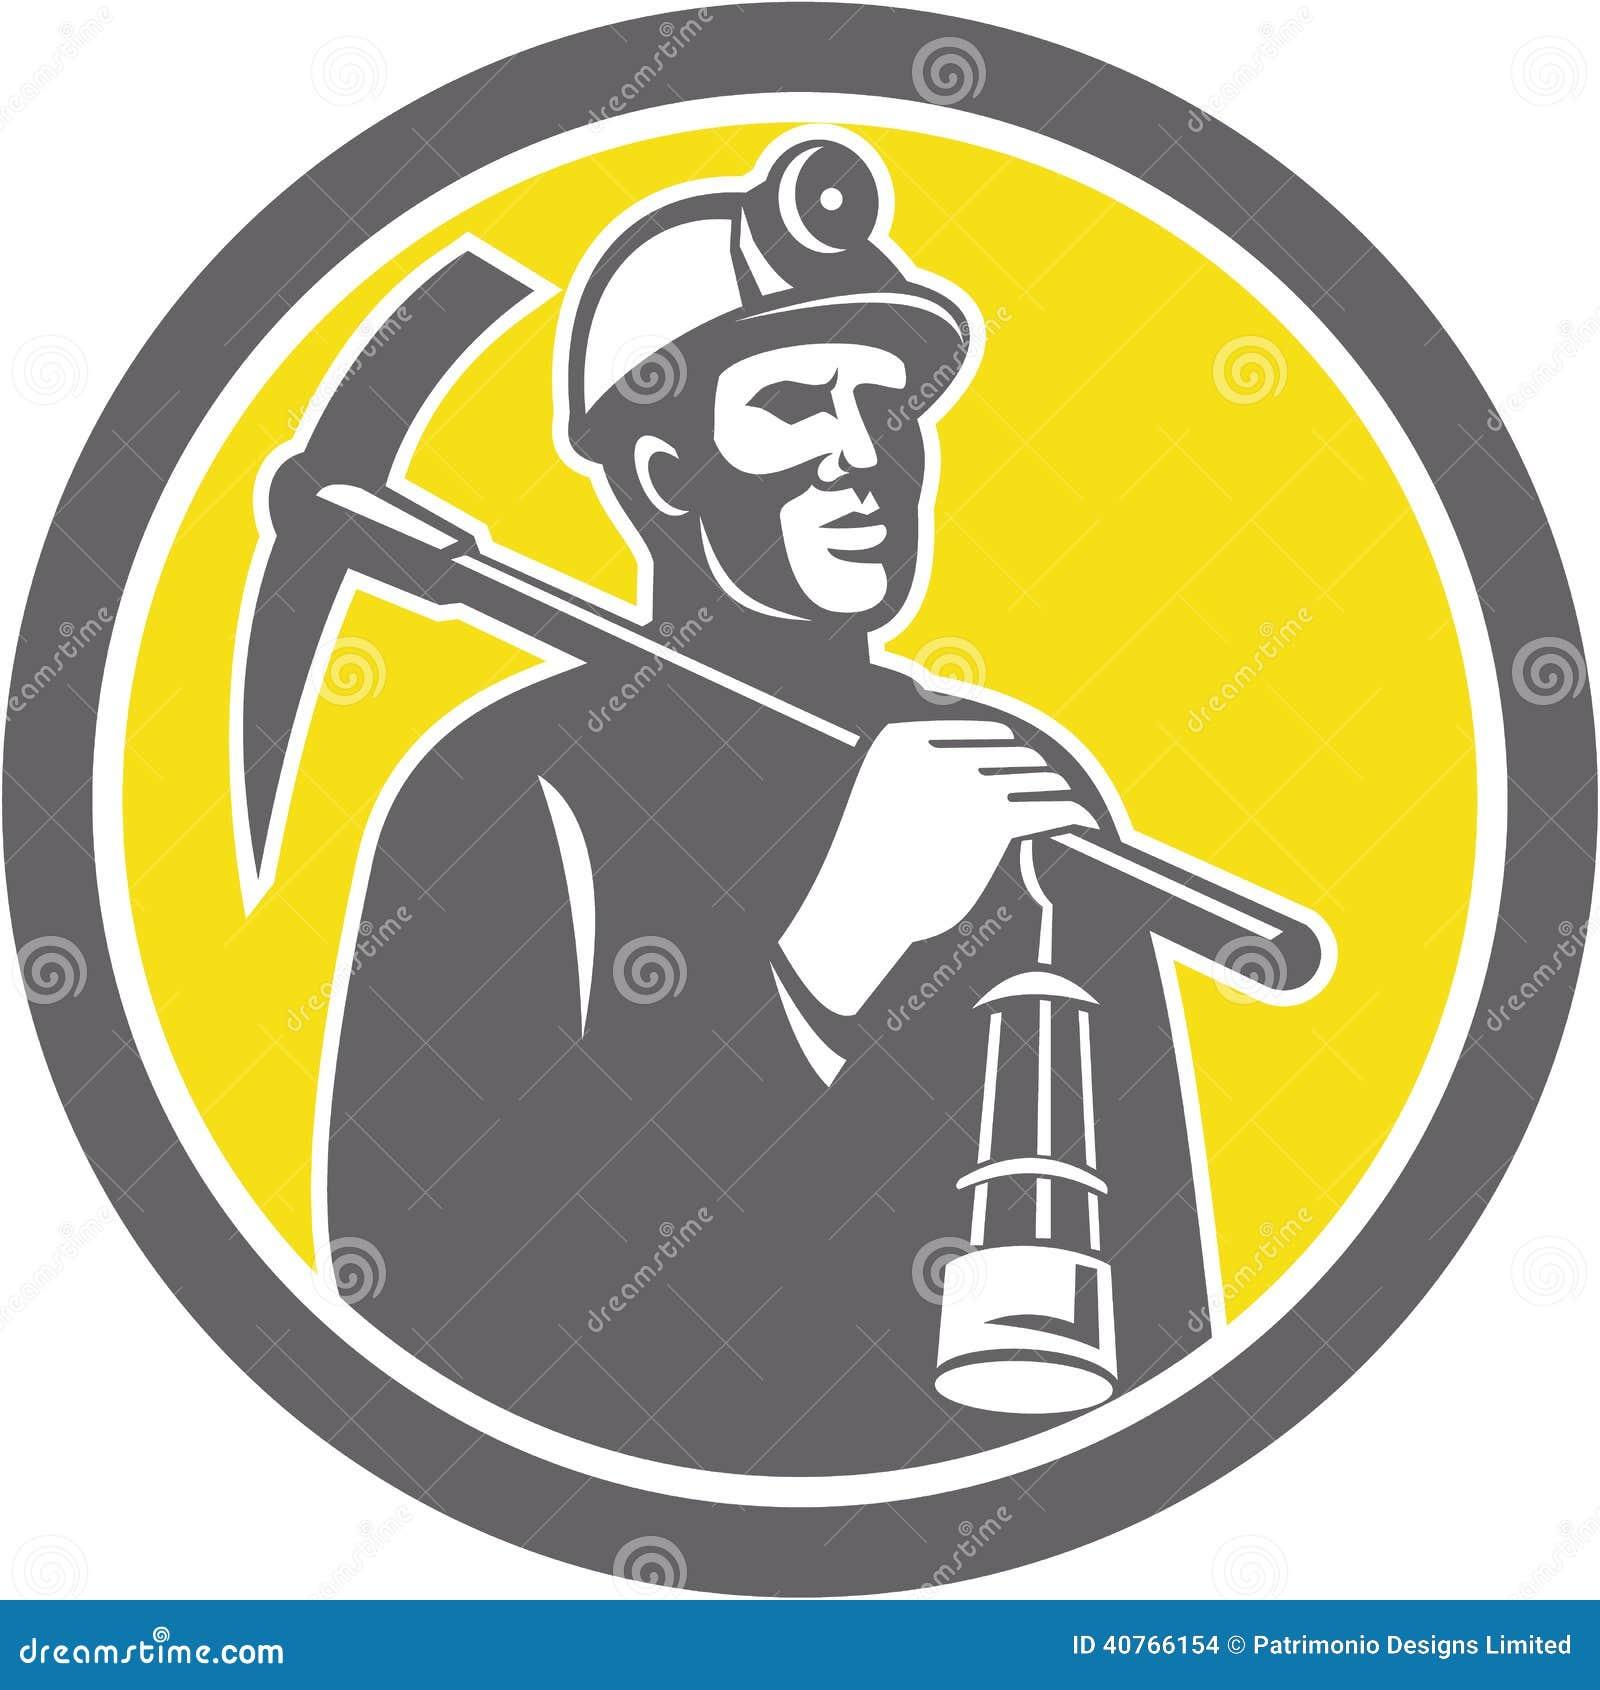 Miner Lamp Stock Illustrations – 206 Miner Lamp Stock ...